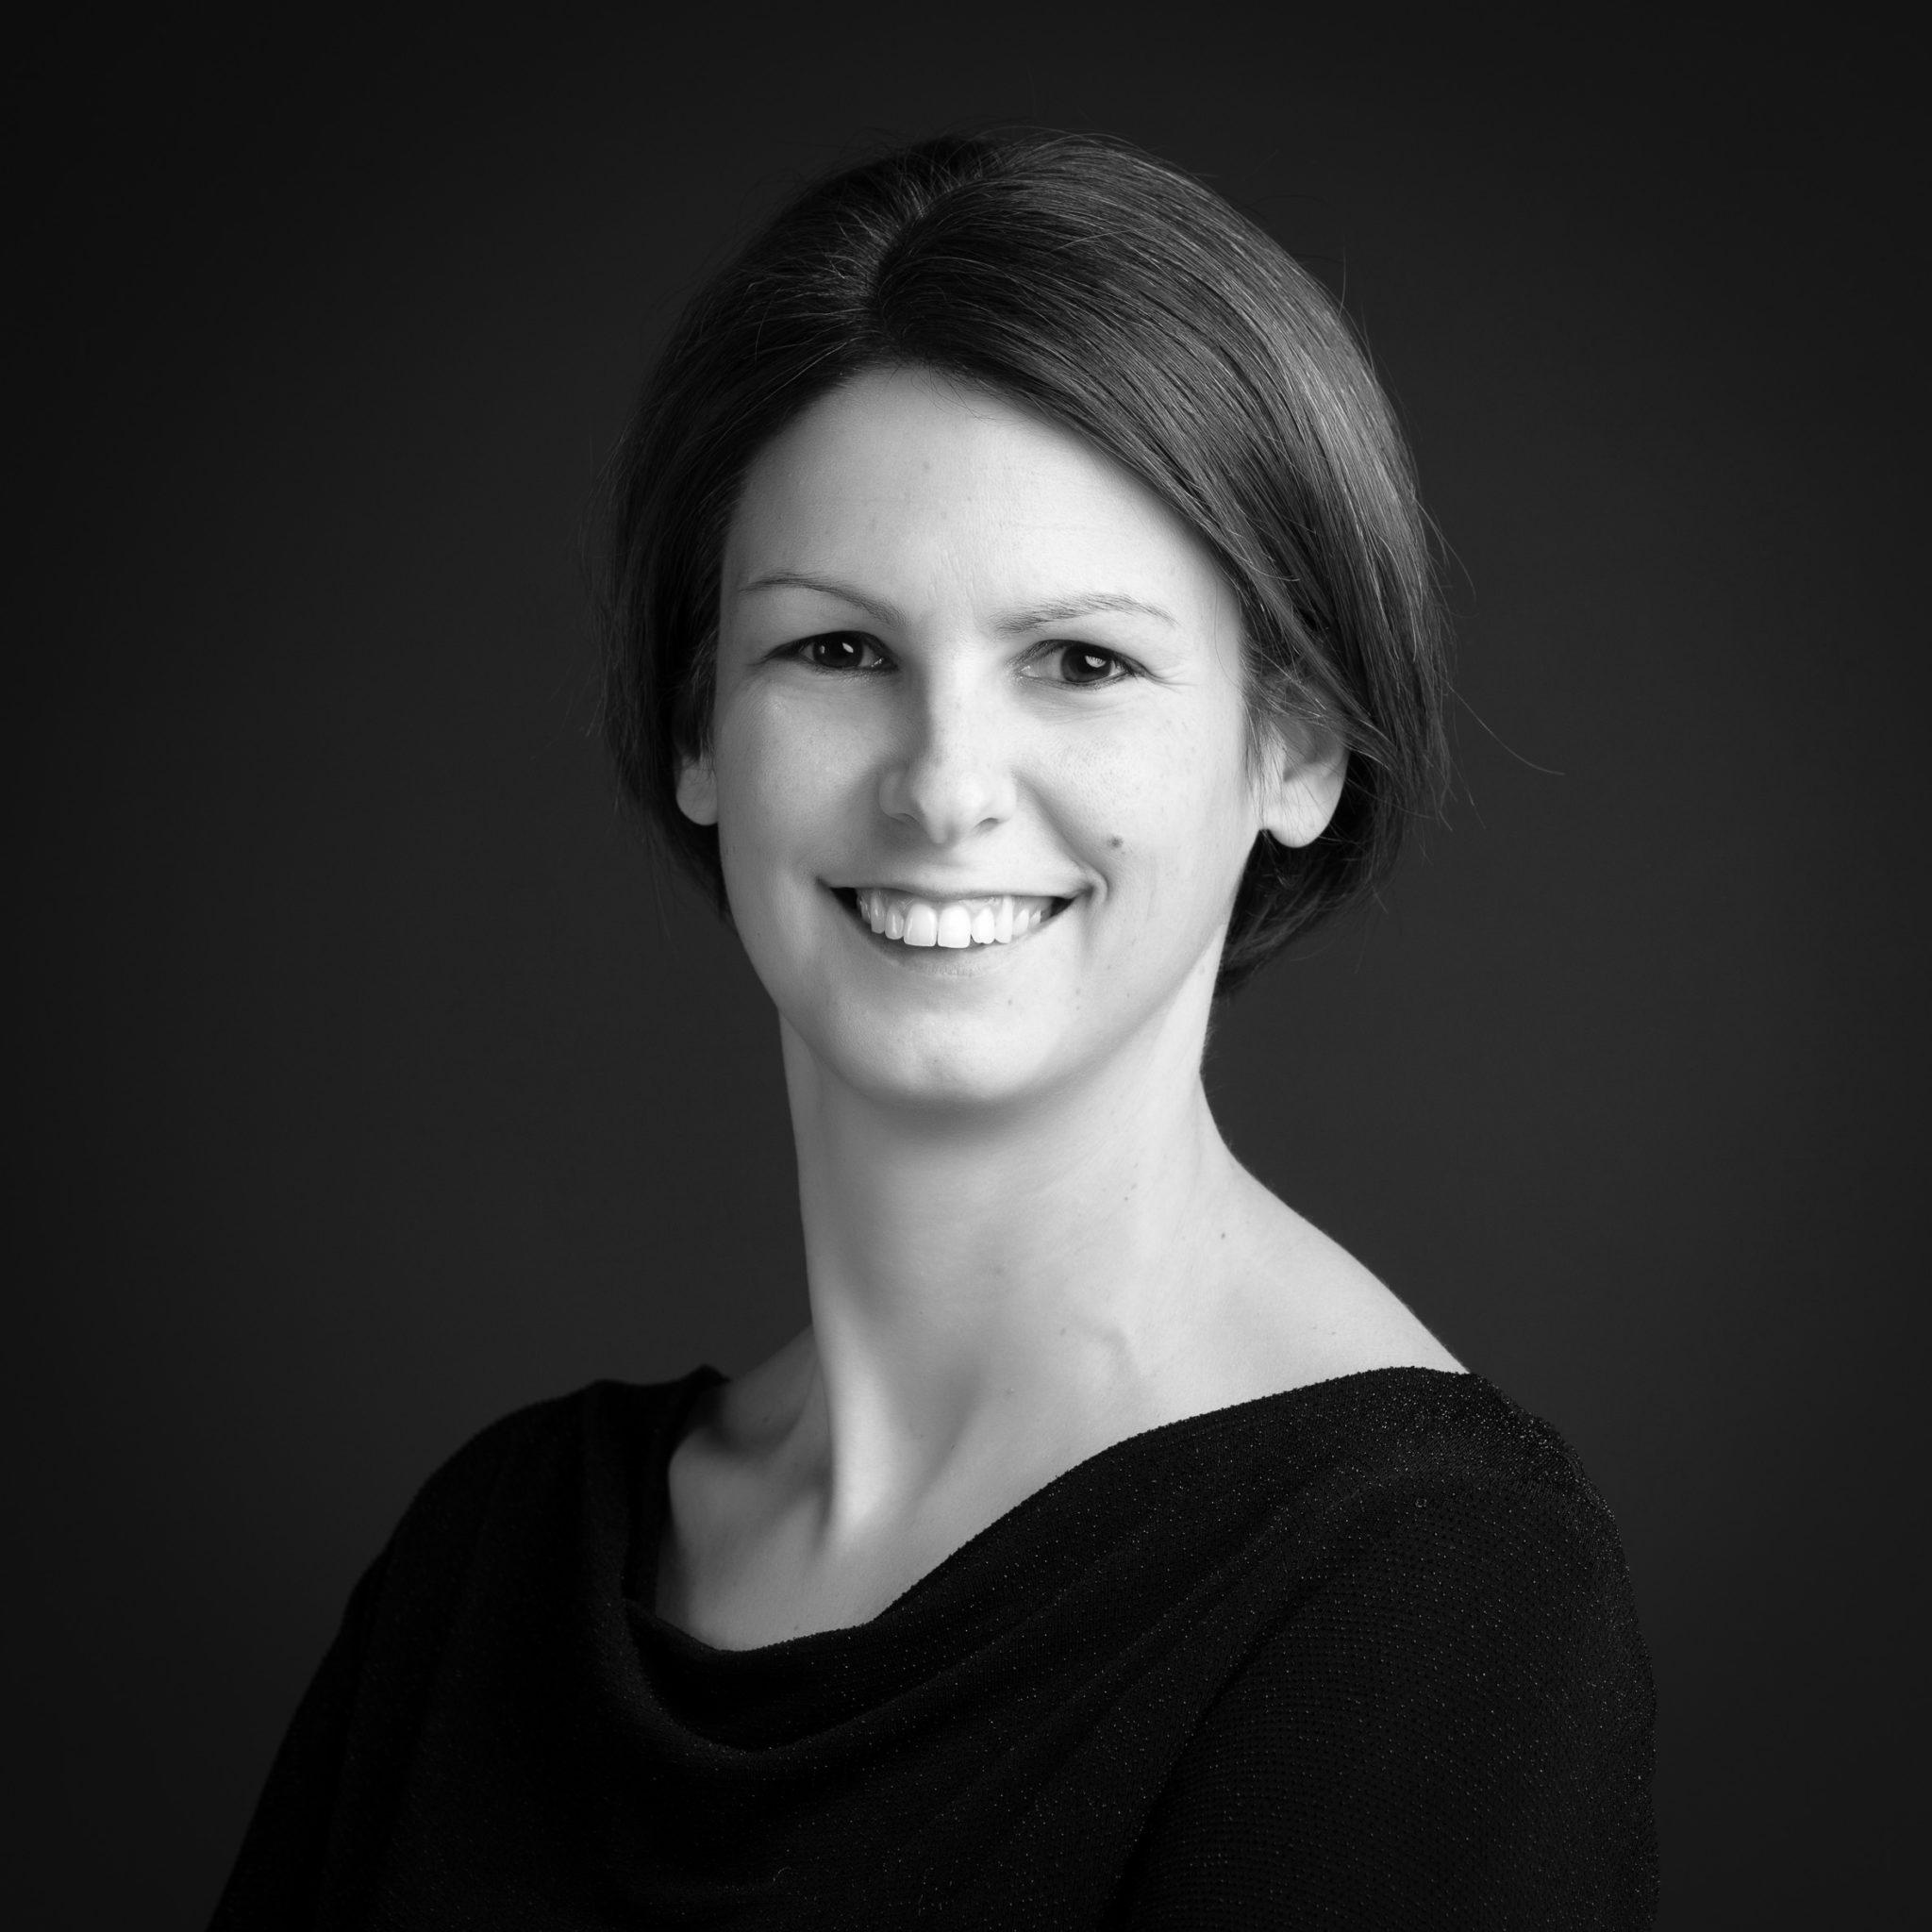 Katleen De Samblancx